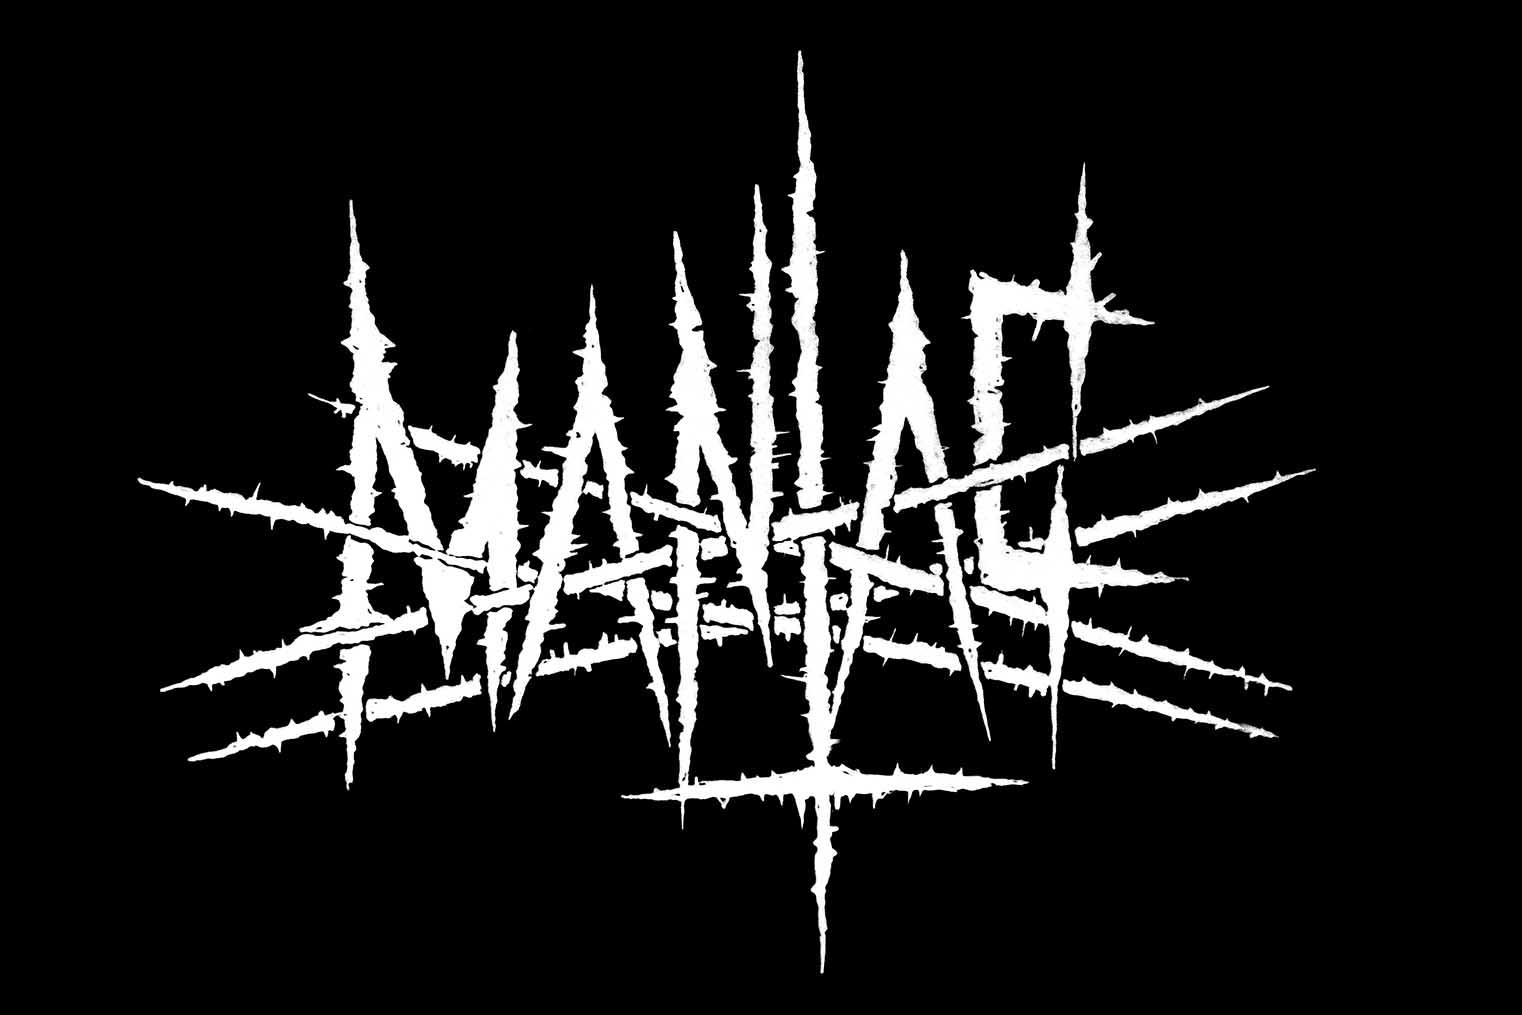 Sucios Logo Maniac metal sucio recin 1522x1015